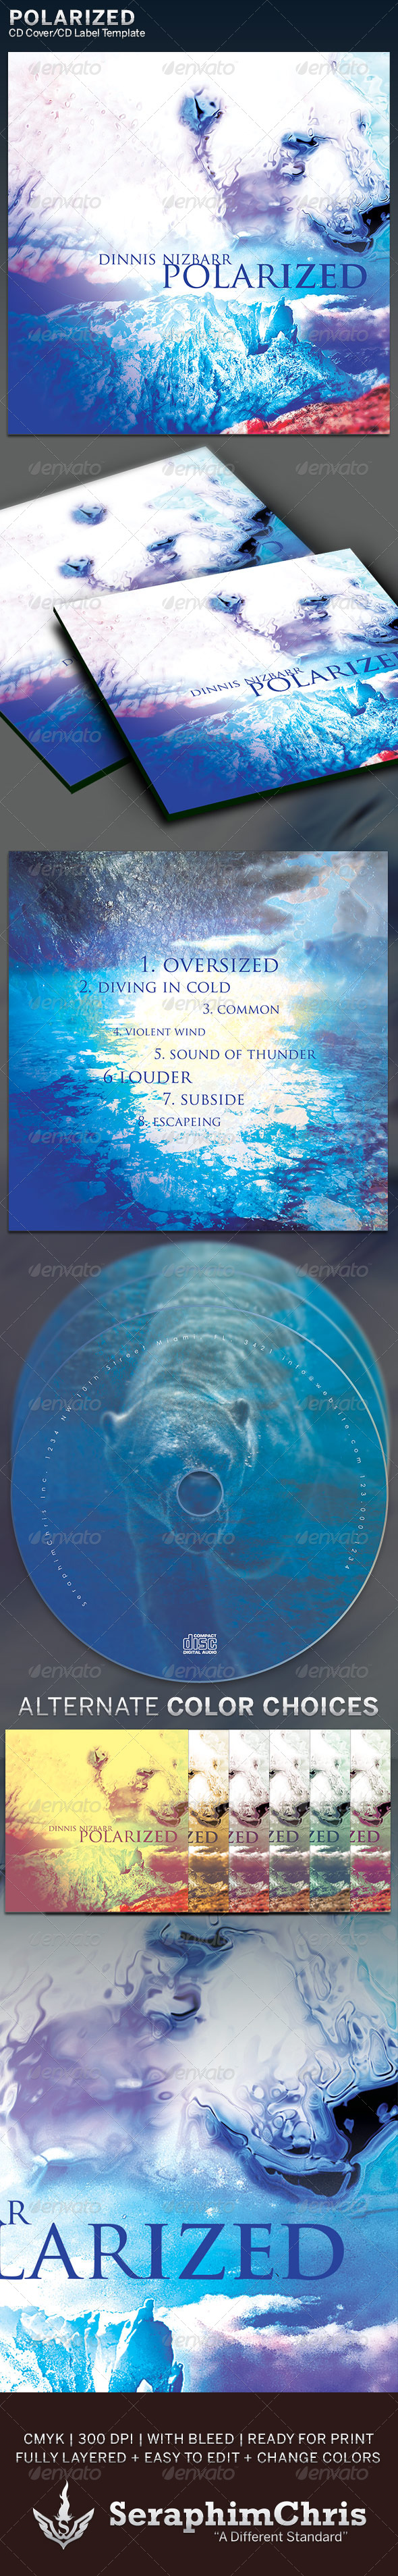 Polarized: CD Cover Artwork Template - CD & DVD Artwork Print Templates